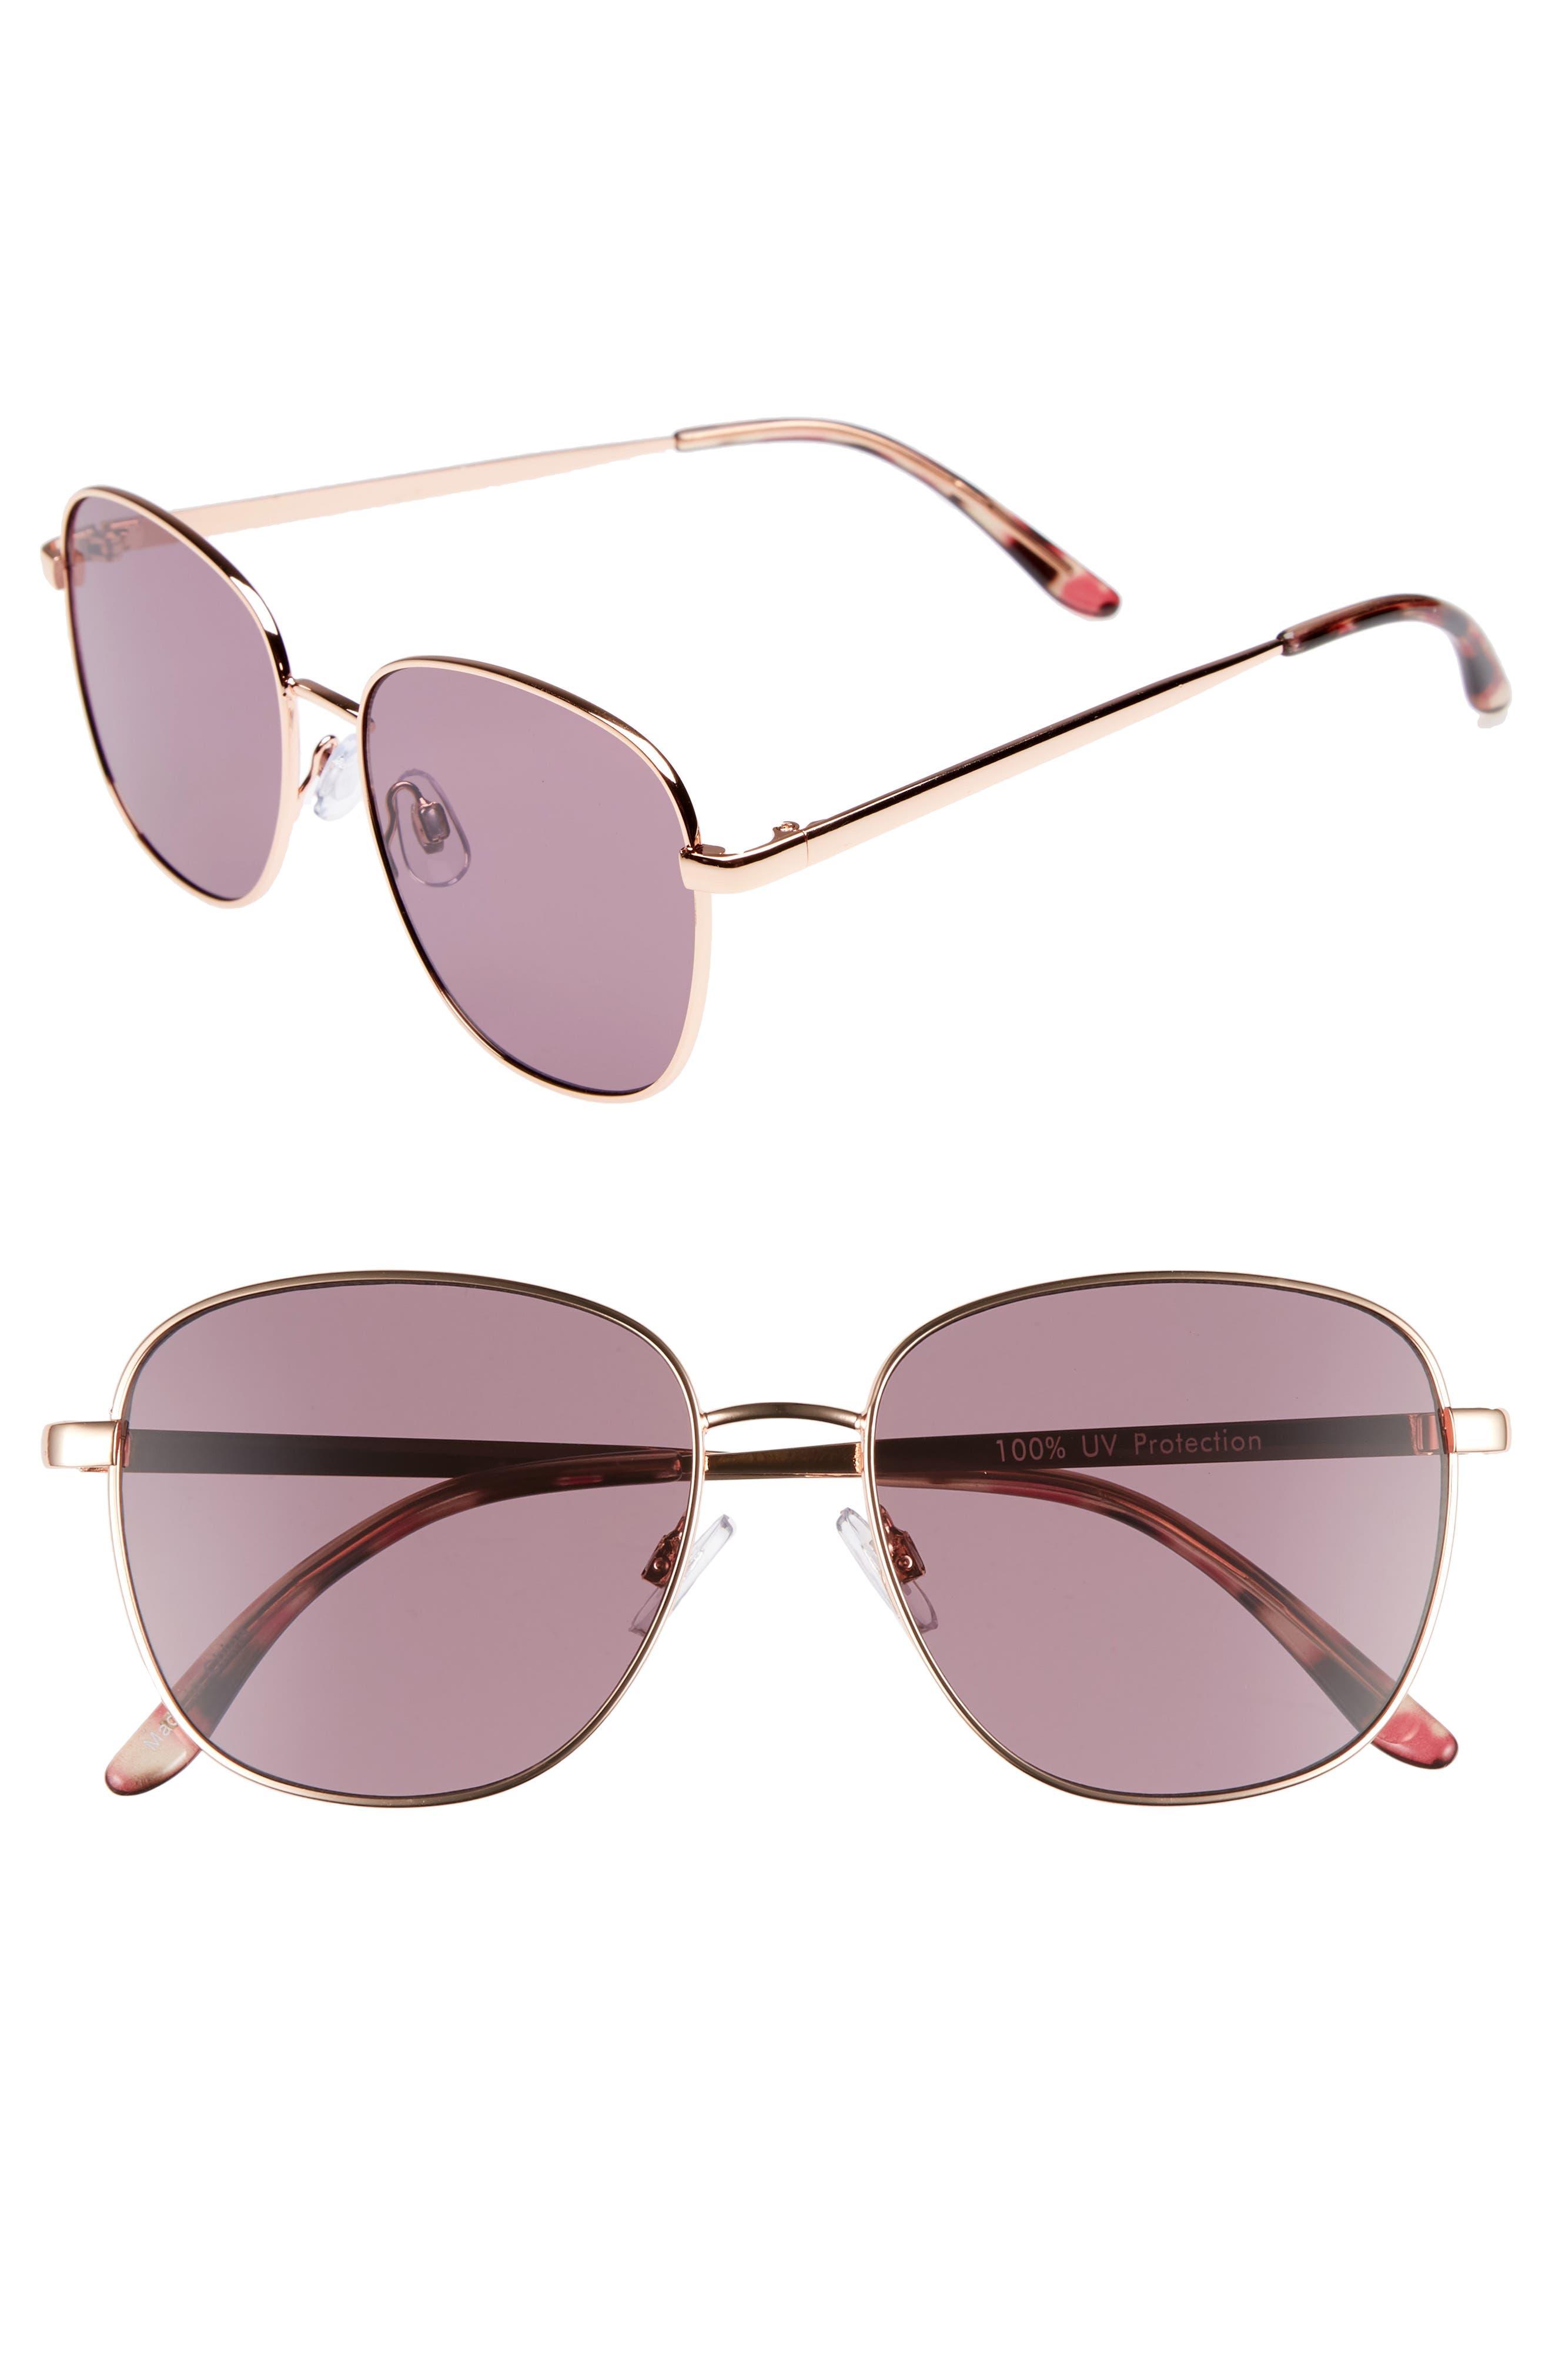 53mm Square Sunglasses,                             Main thumbnail 1, color,                             ROSE GOLD/ PURPLE